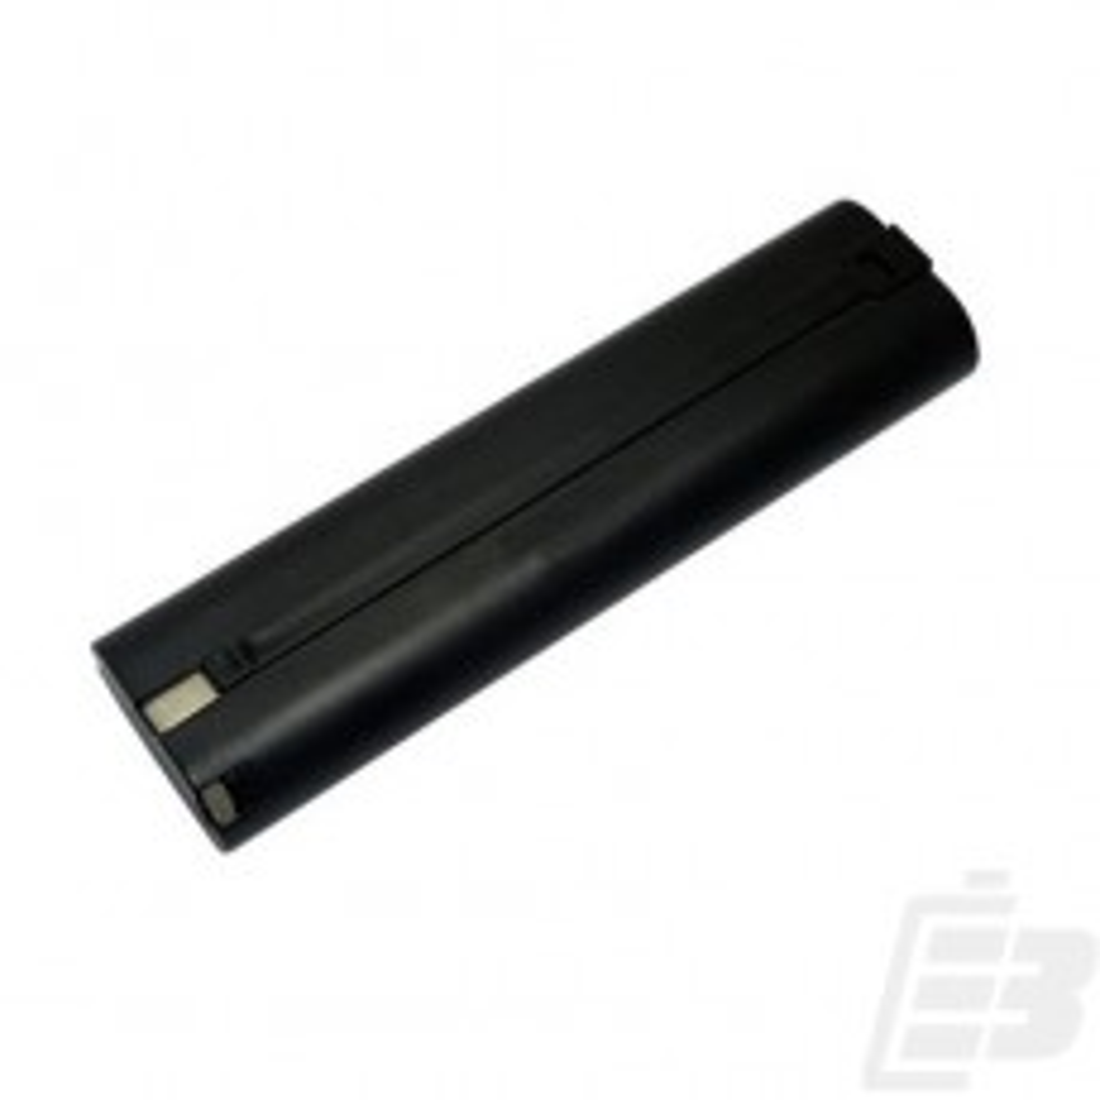 Power tool battery Makita 9.6V 2.0Ah_1